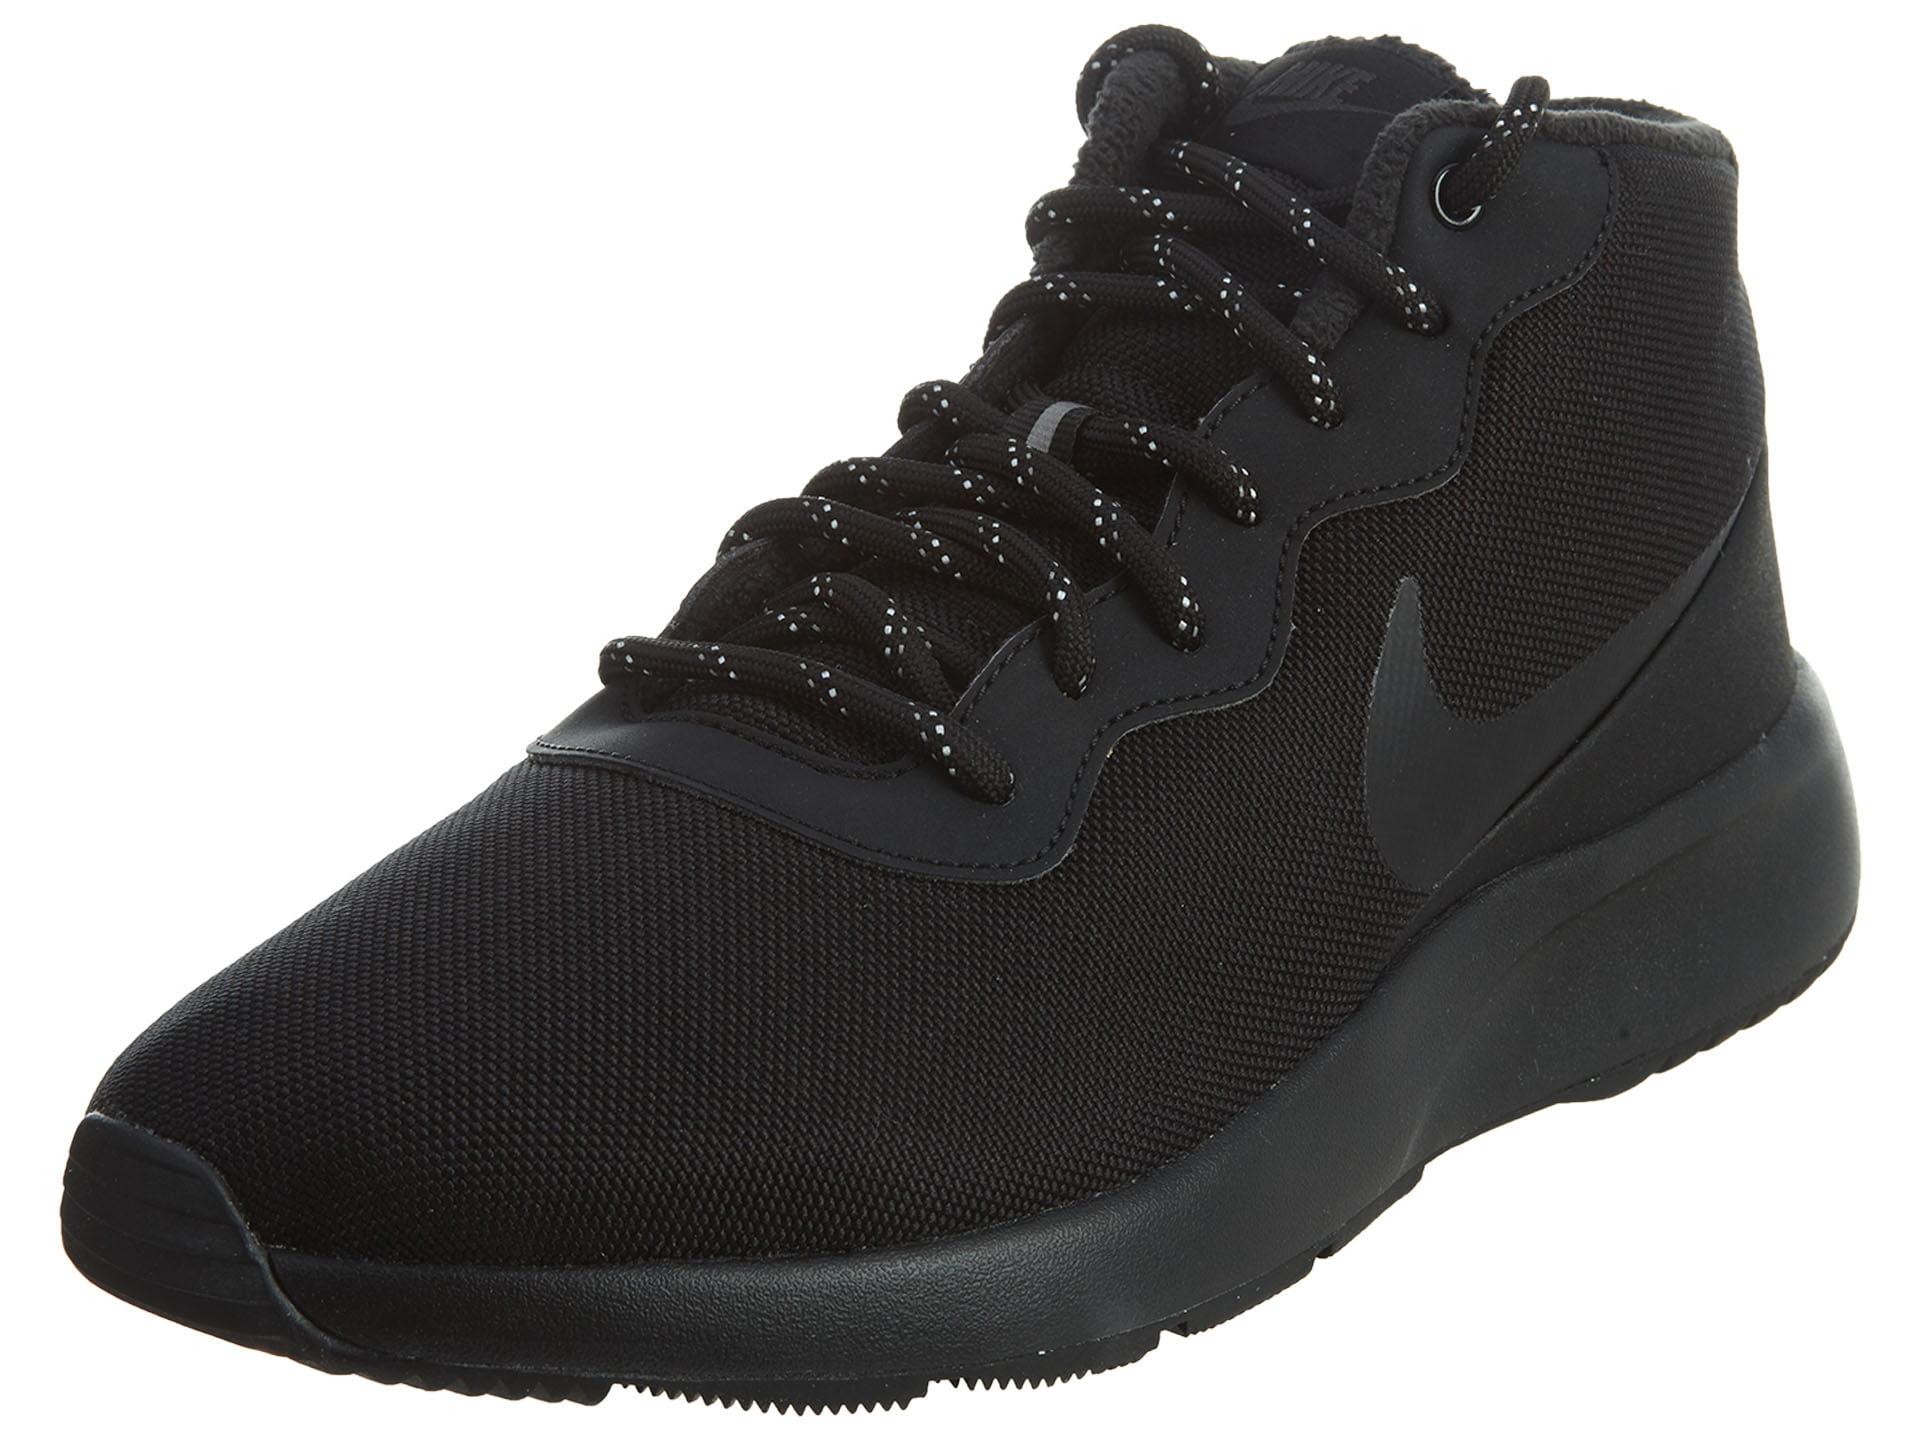 Nike - Nike Tanjun Chukka Mens Style